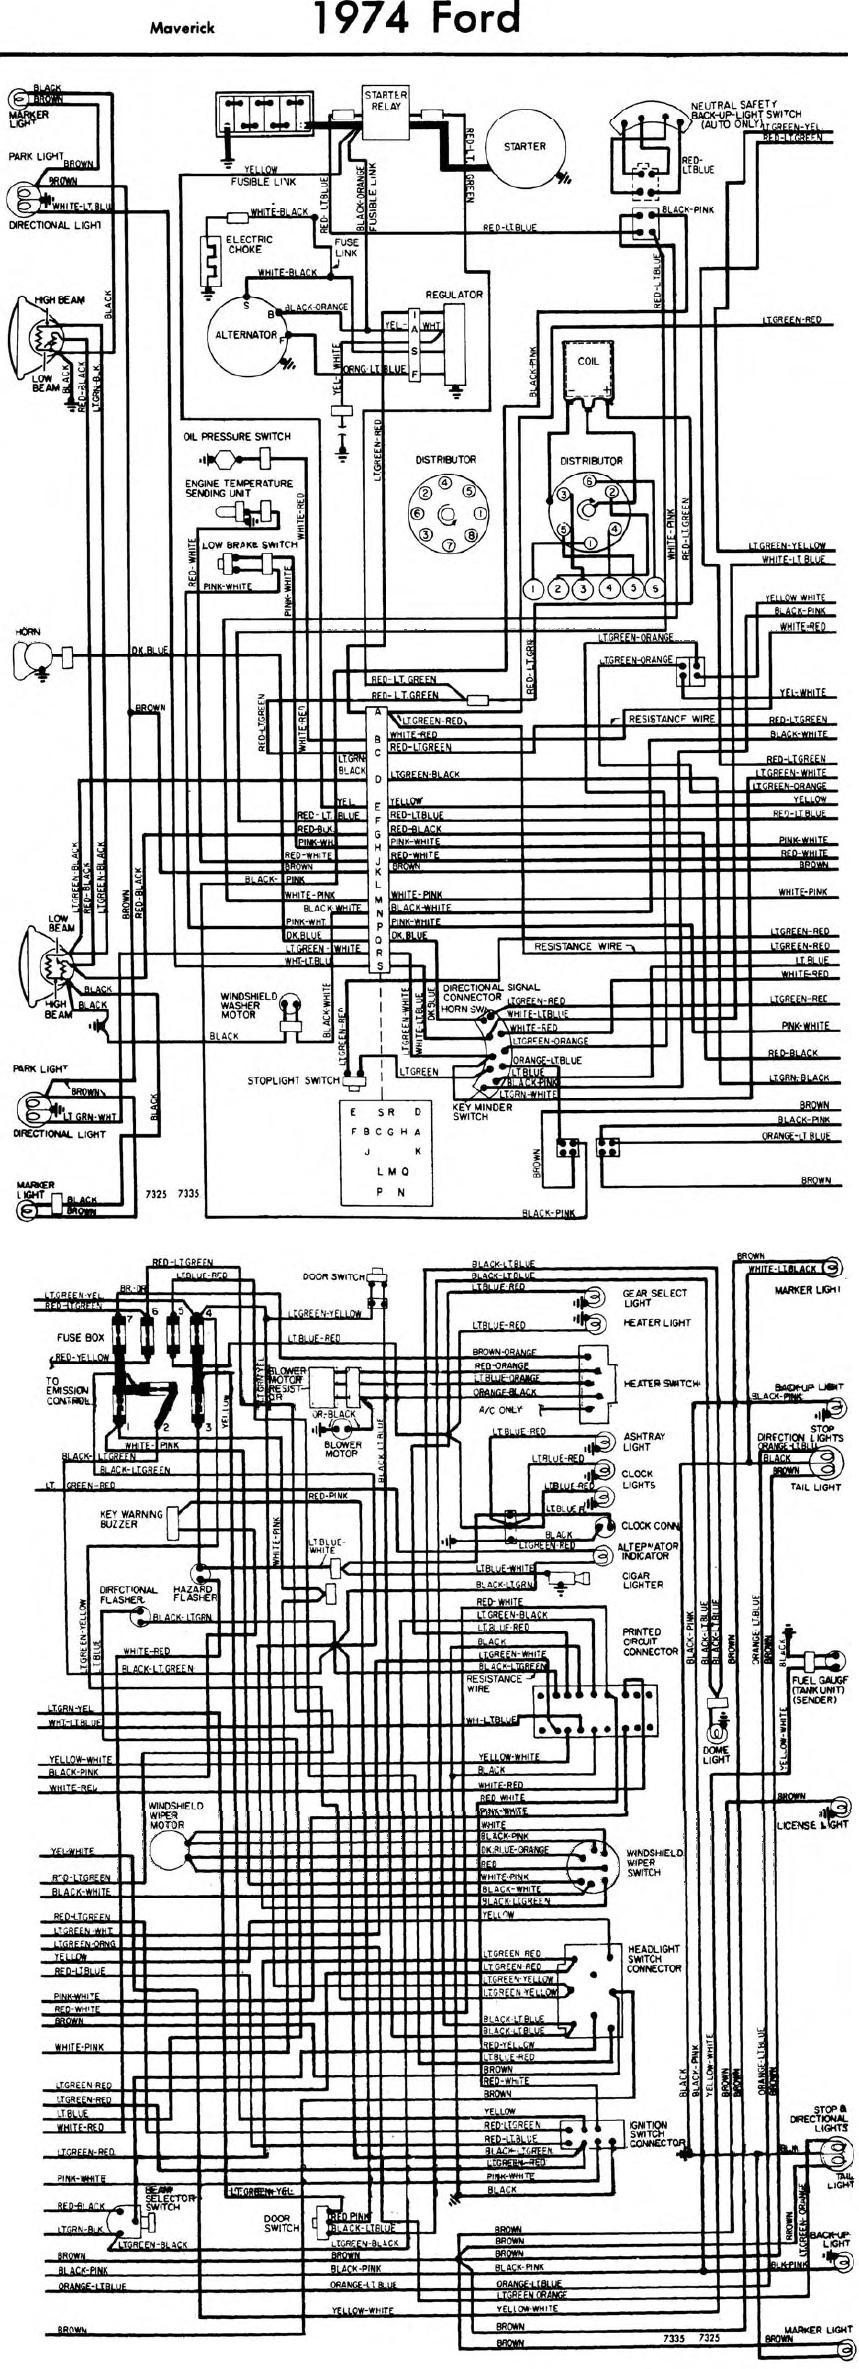 medium resolution of 1970 ford maverick wiring diagram wiring schematic data 95 ford starter solenoid wiring diagram 1970 ford